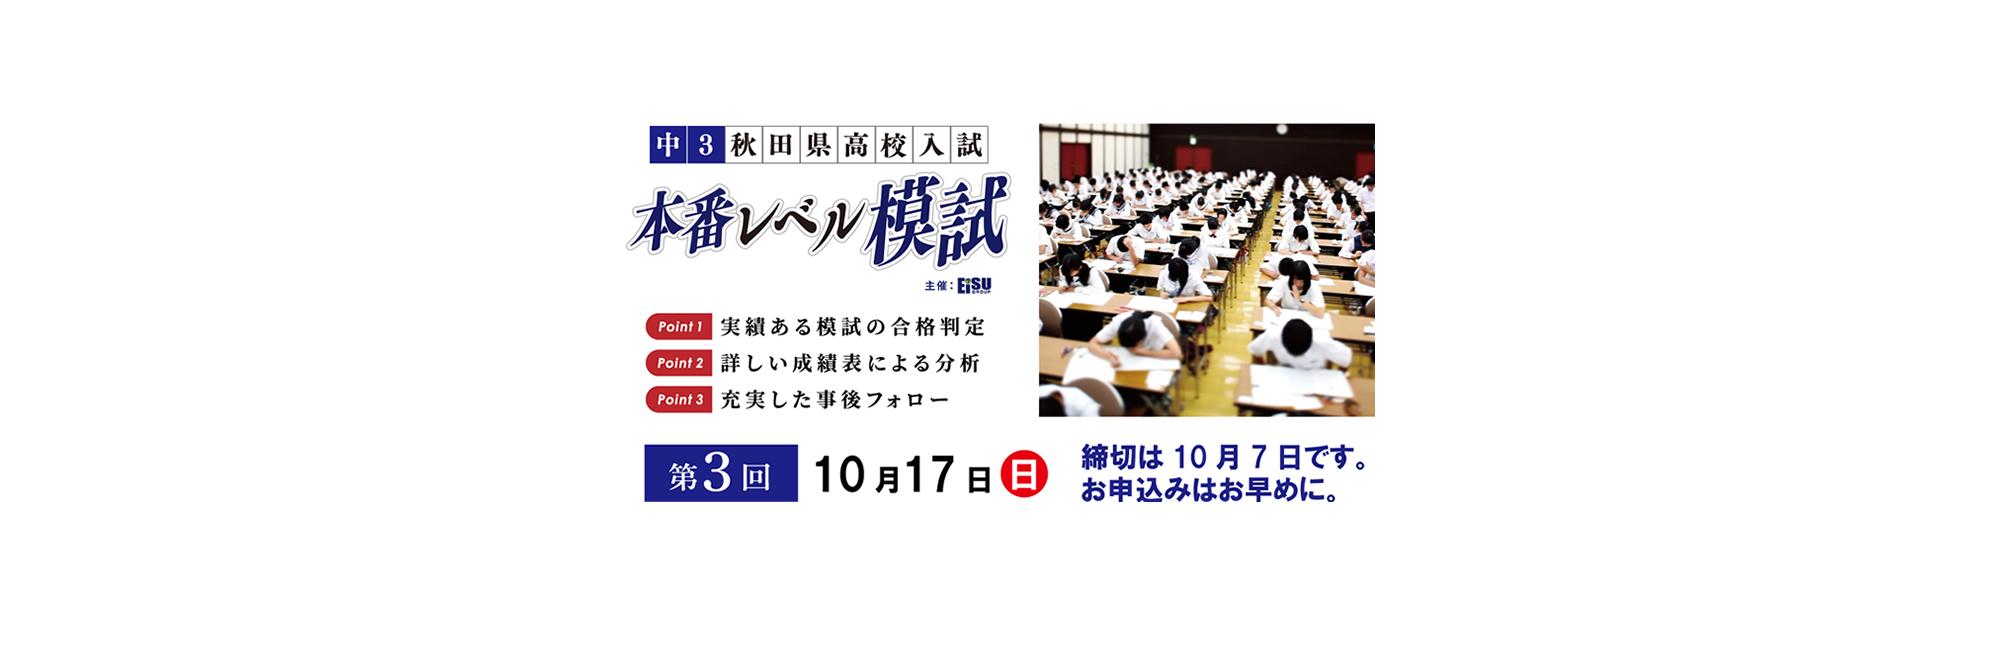 中3秋田県高校入試 本番レベル模試